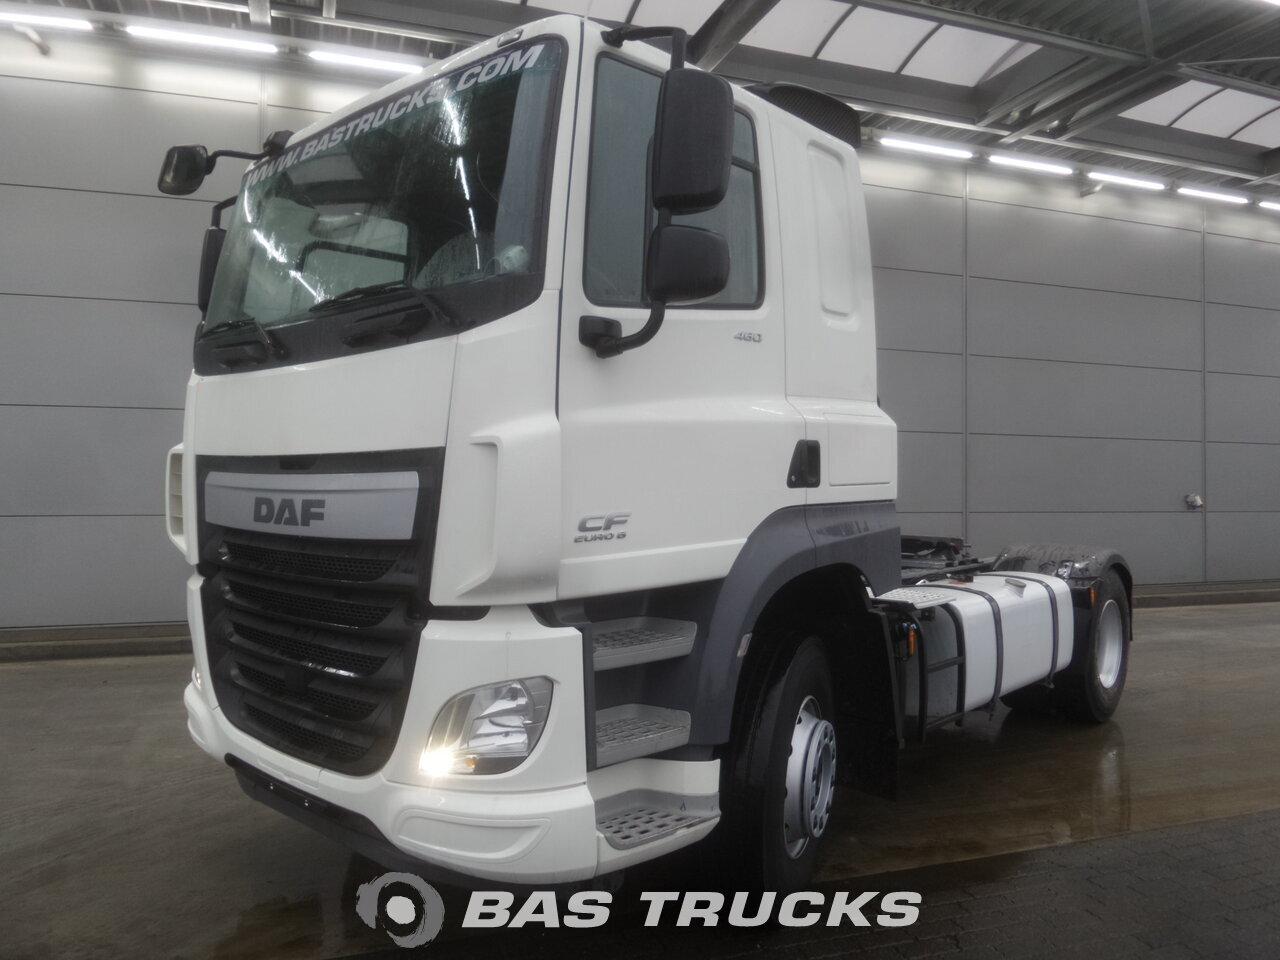 daf cf 460 tracteur euro 6 34600 bas trucks. Black Bedroom Furniture Sets. Home Design Ideas